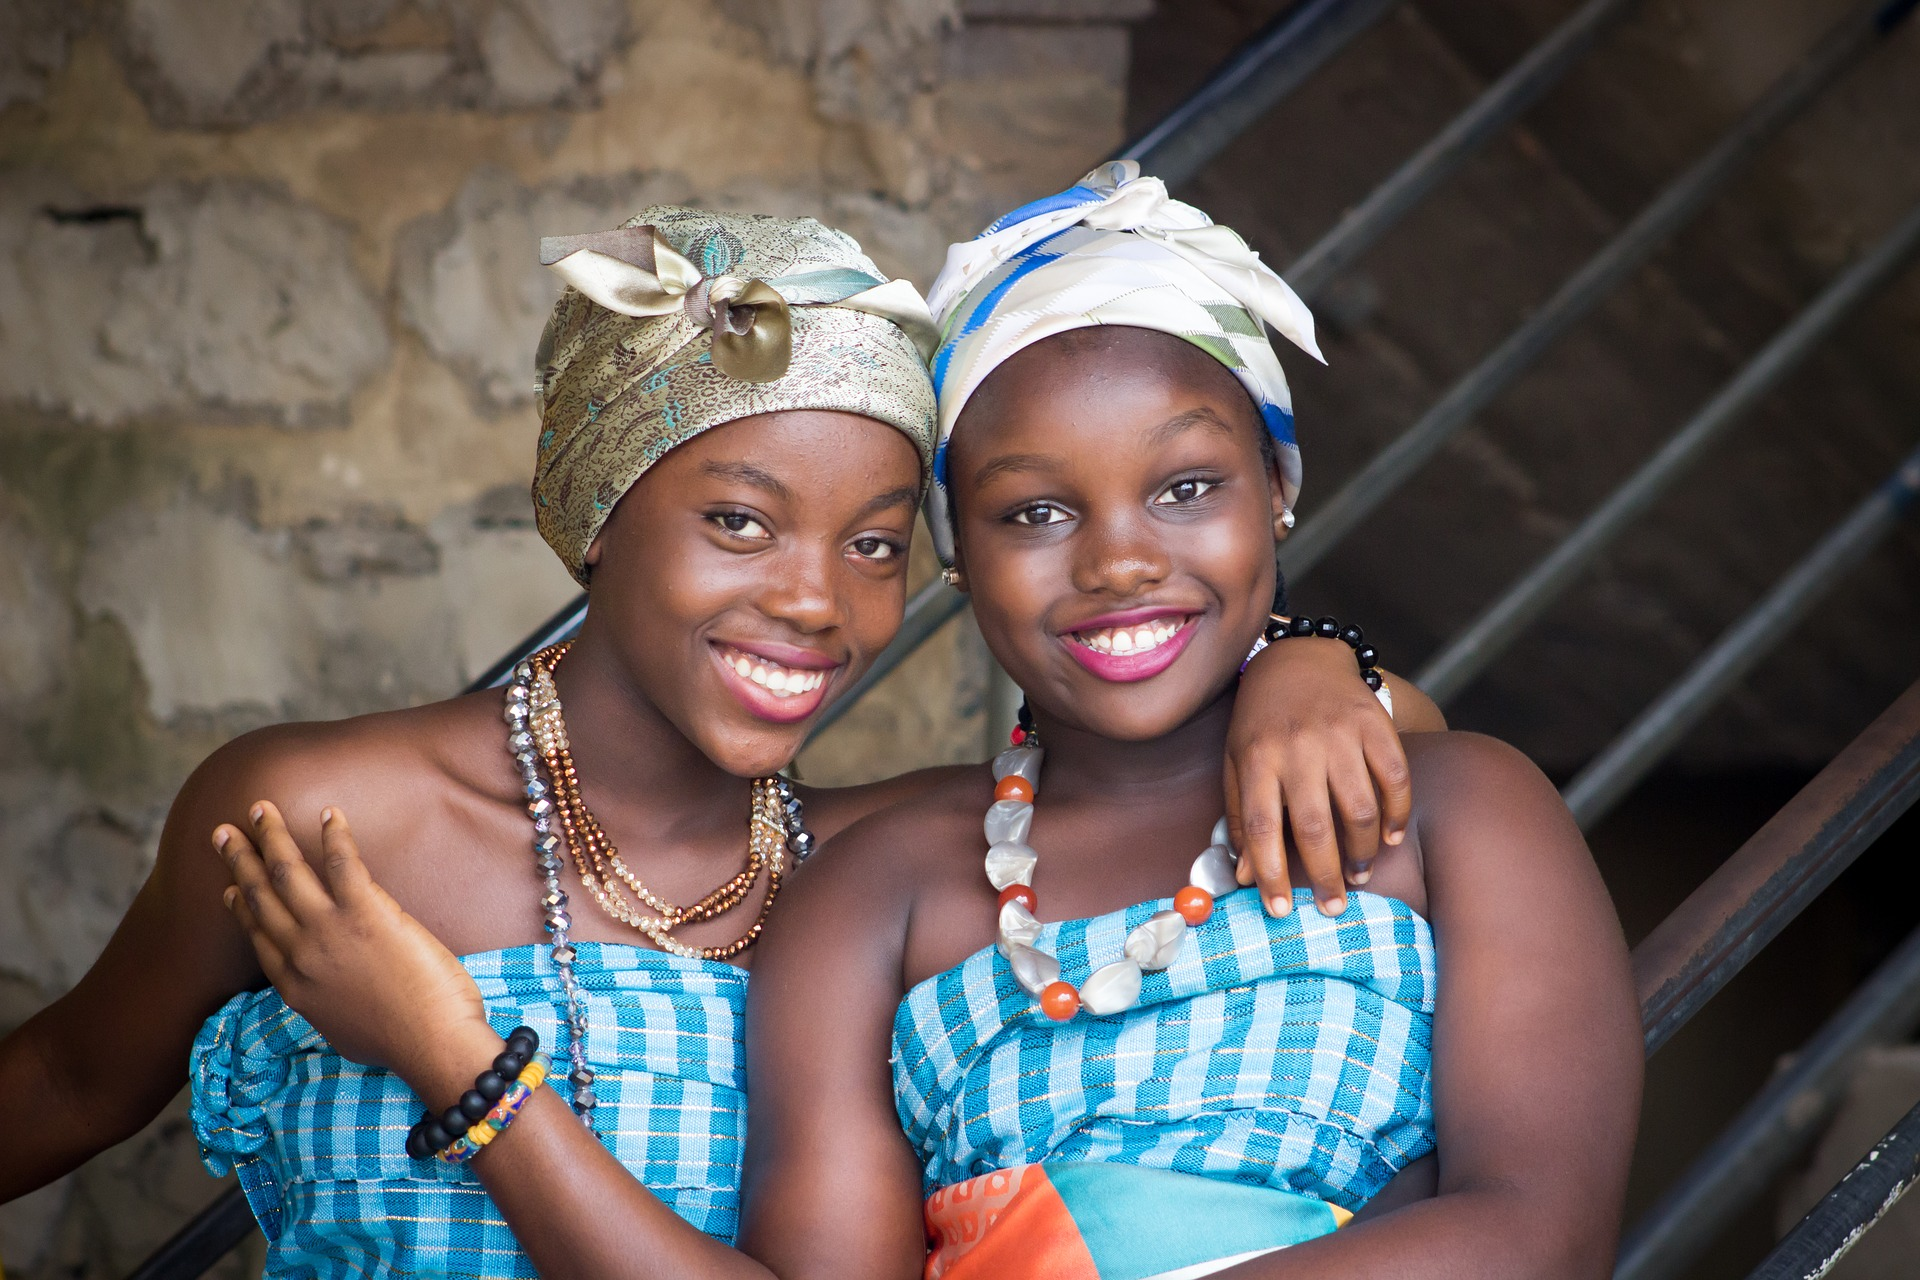 Tansania: 500 Millionen Dollar-Hilfe trotz Verbot schwangerer Schülerinnen?